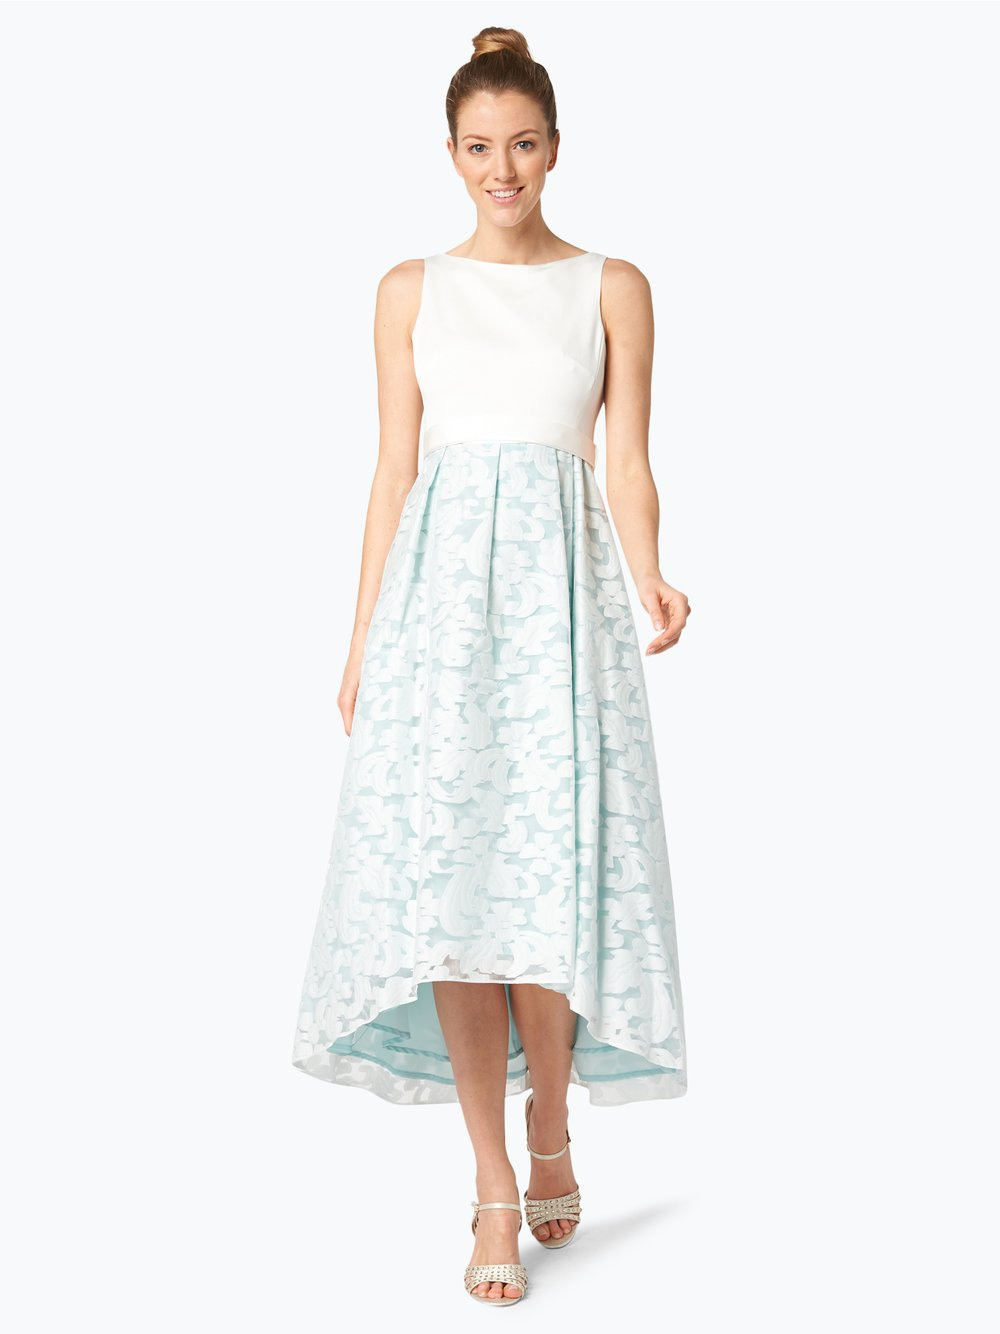 18 Cool Abendkleider Coast Ärmel - Abendkleid